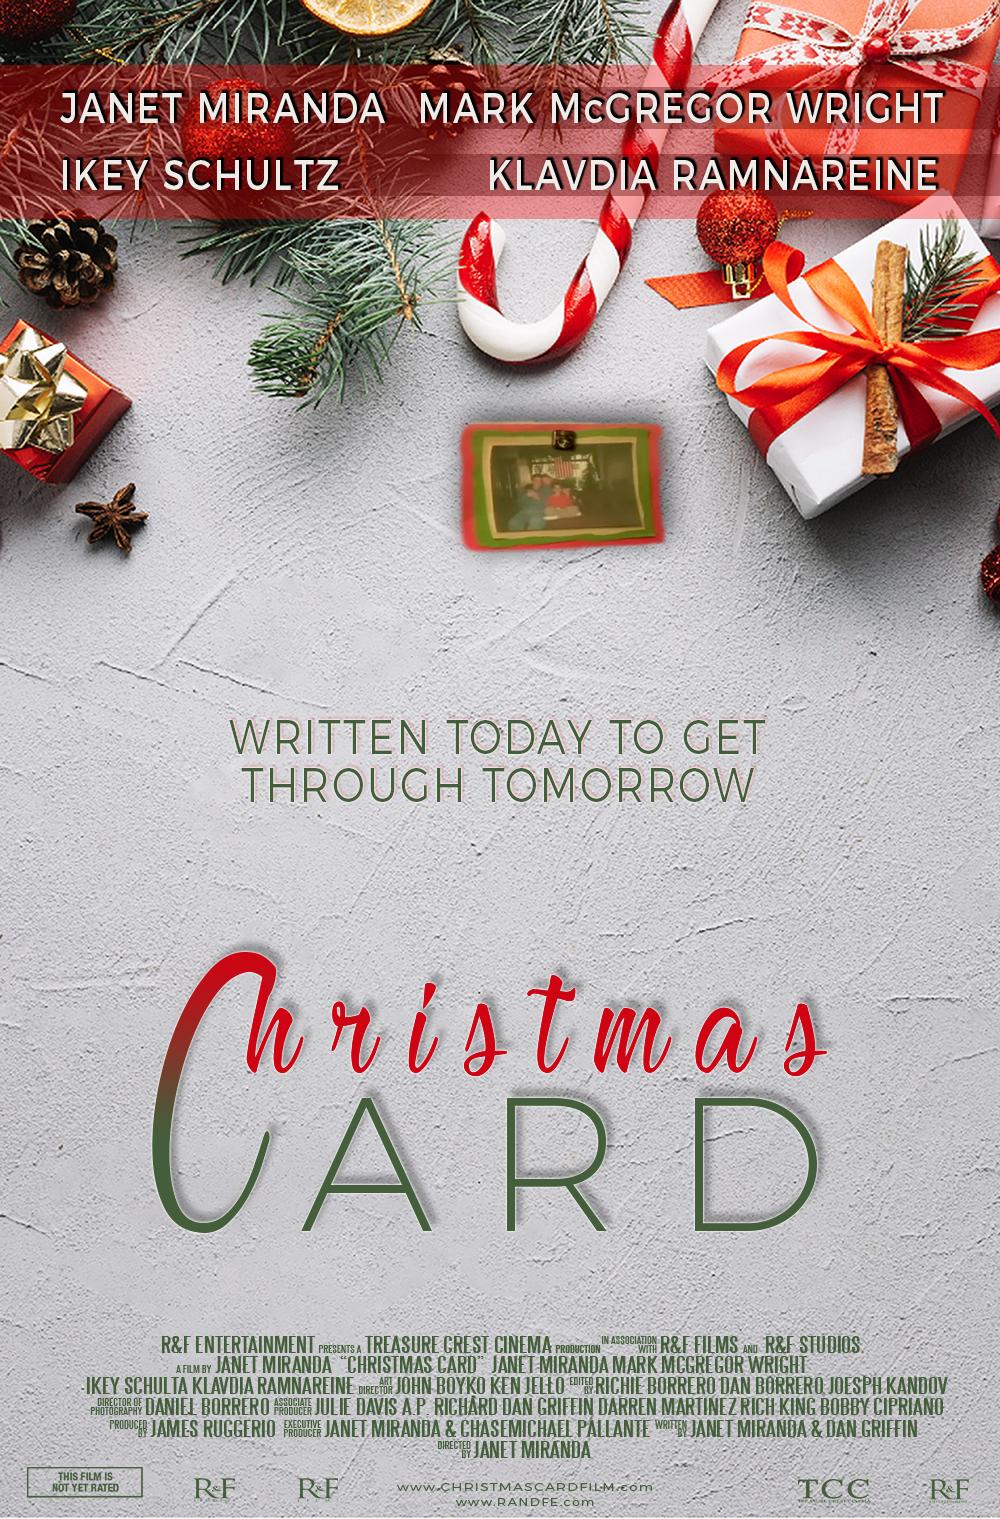 CHRISTMAS CARD MOVIE POSTER